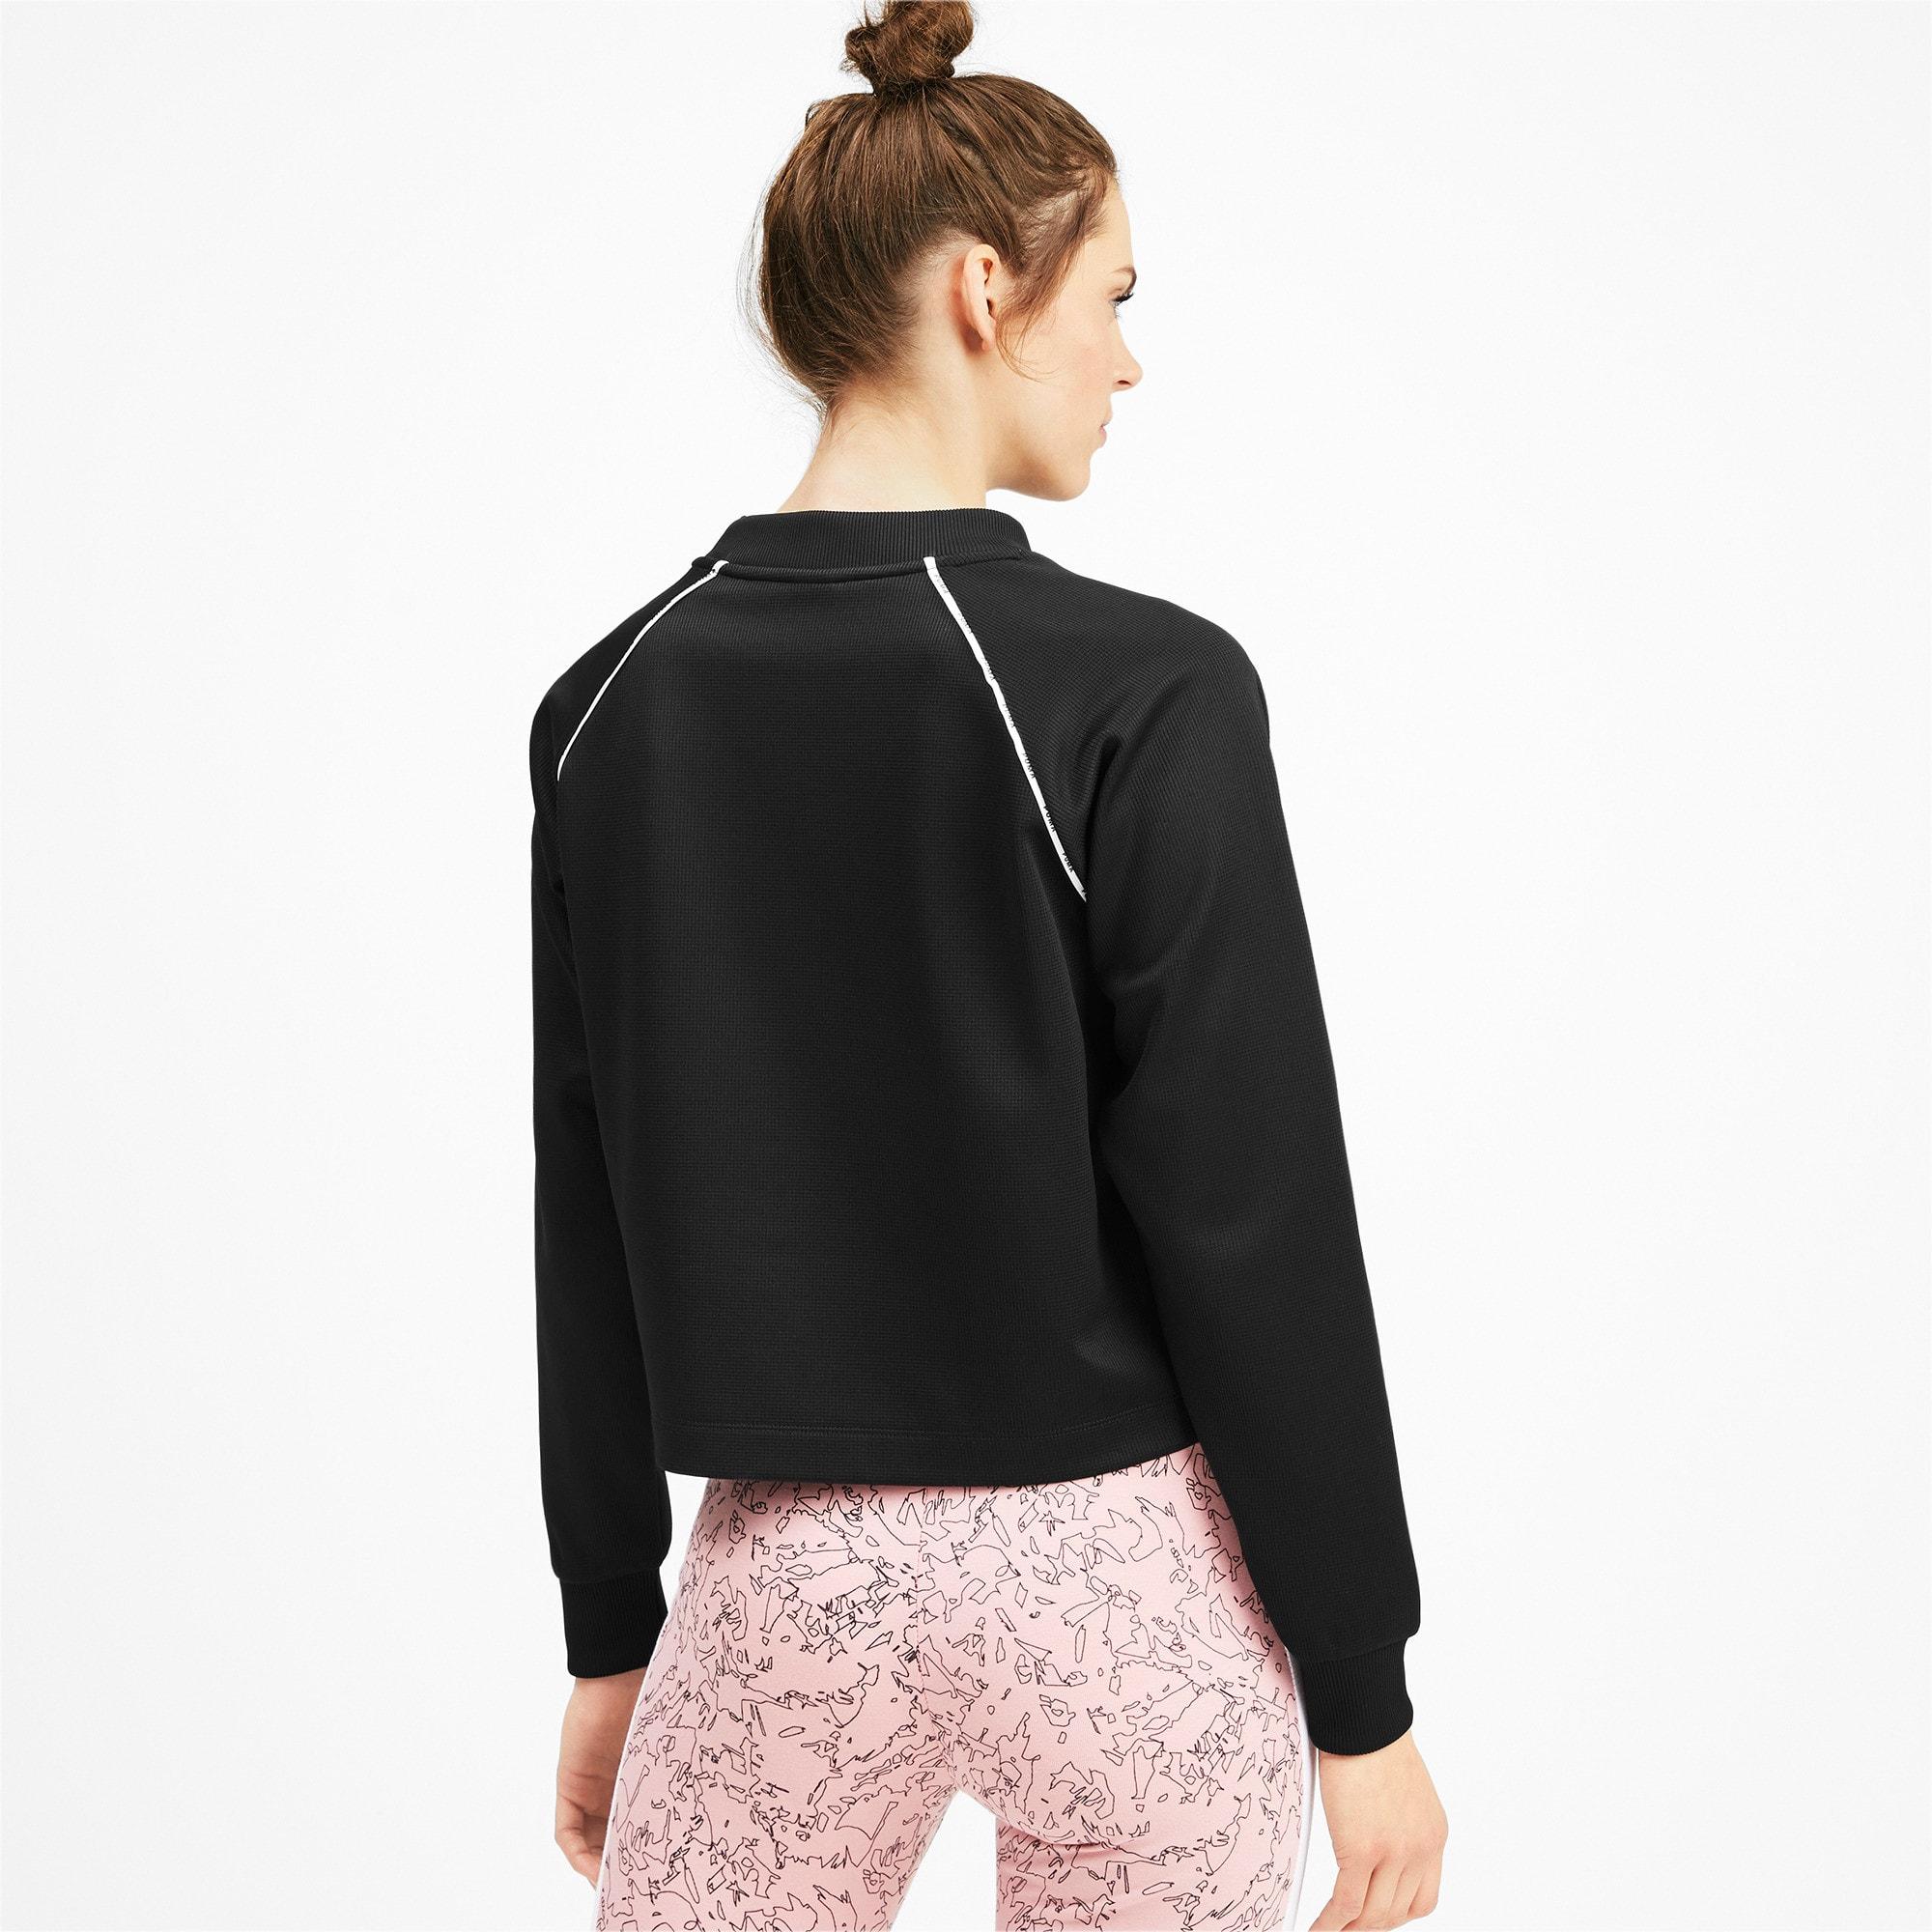 Thumbnail 2 of PUMA XTG Women's Crewneck Sweatshirt, Puma Black, medium